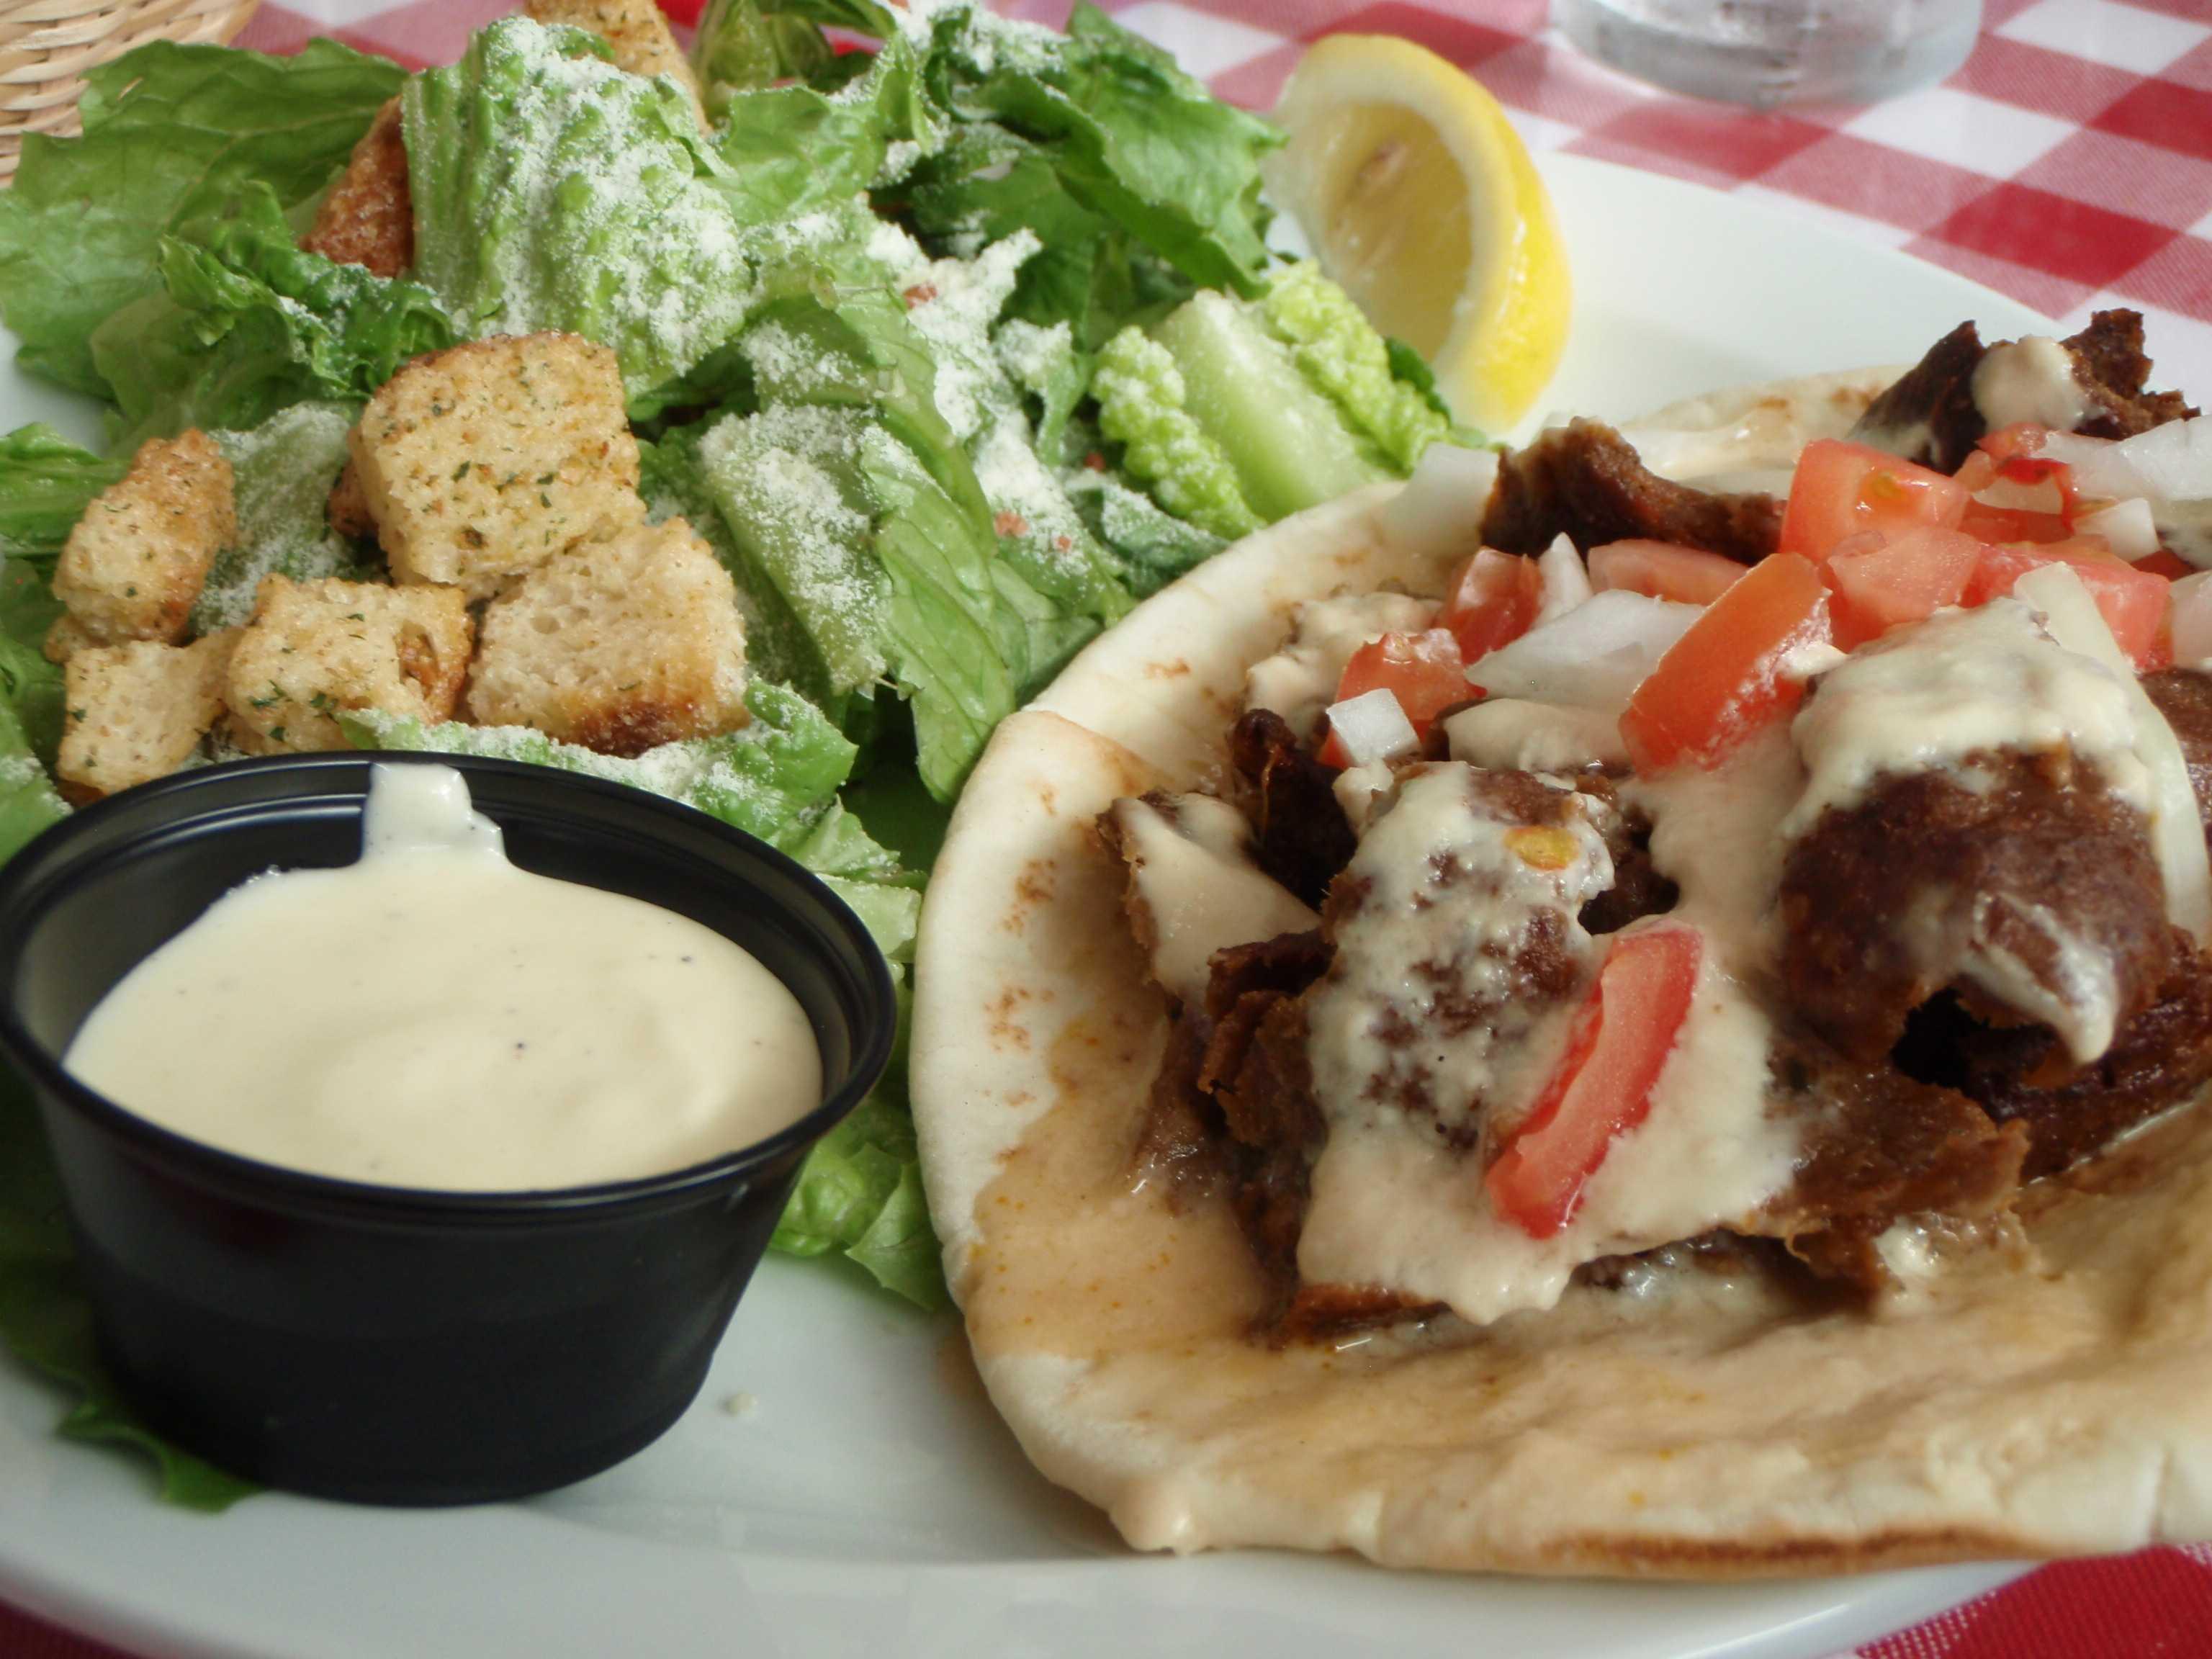 Bucataria orientala - falafel pe farfurie, servita cu salata si sosuri